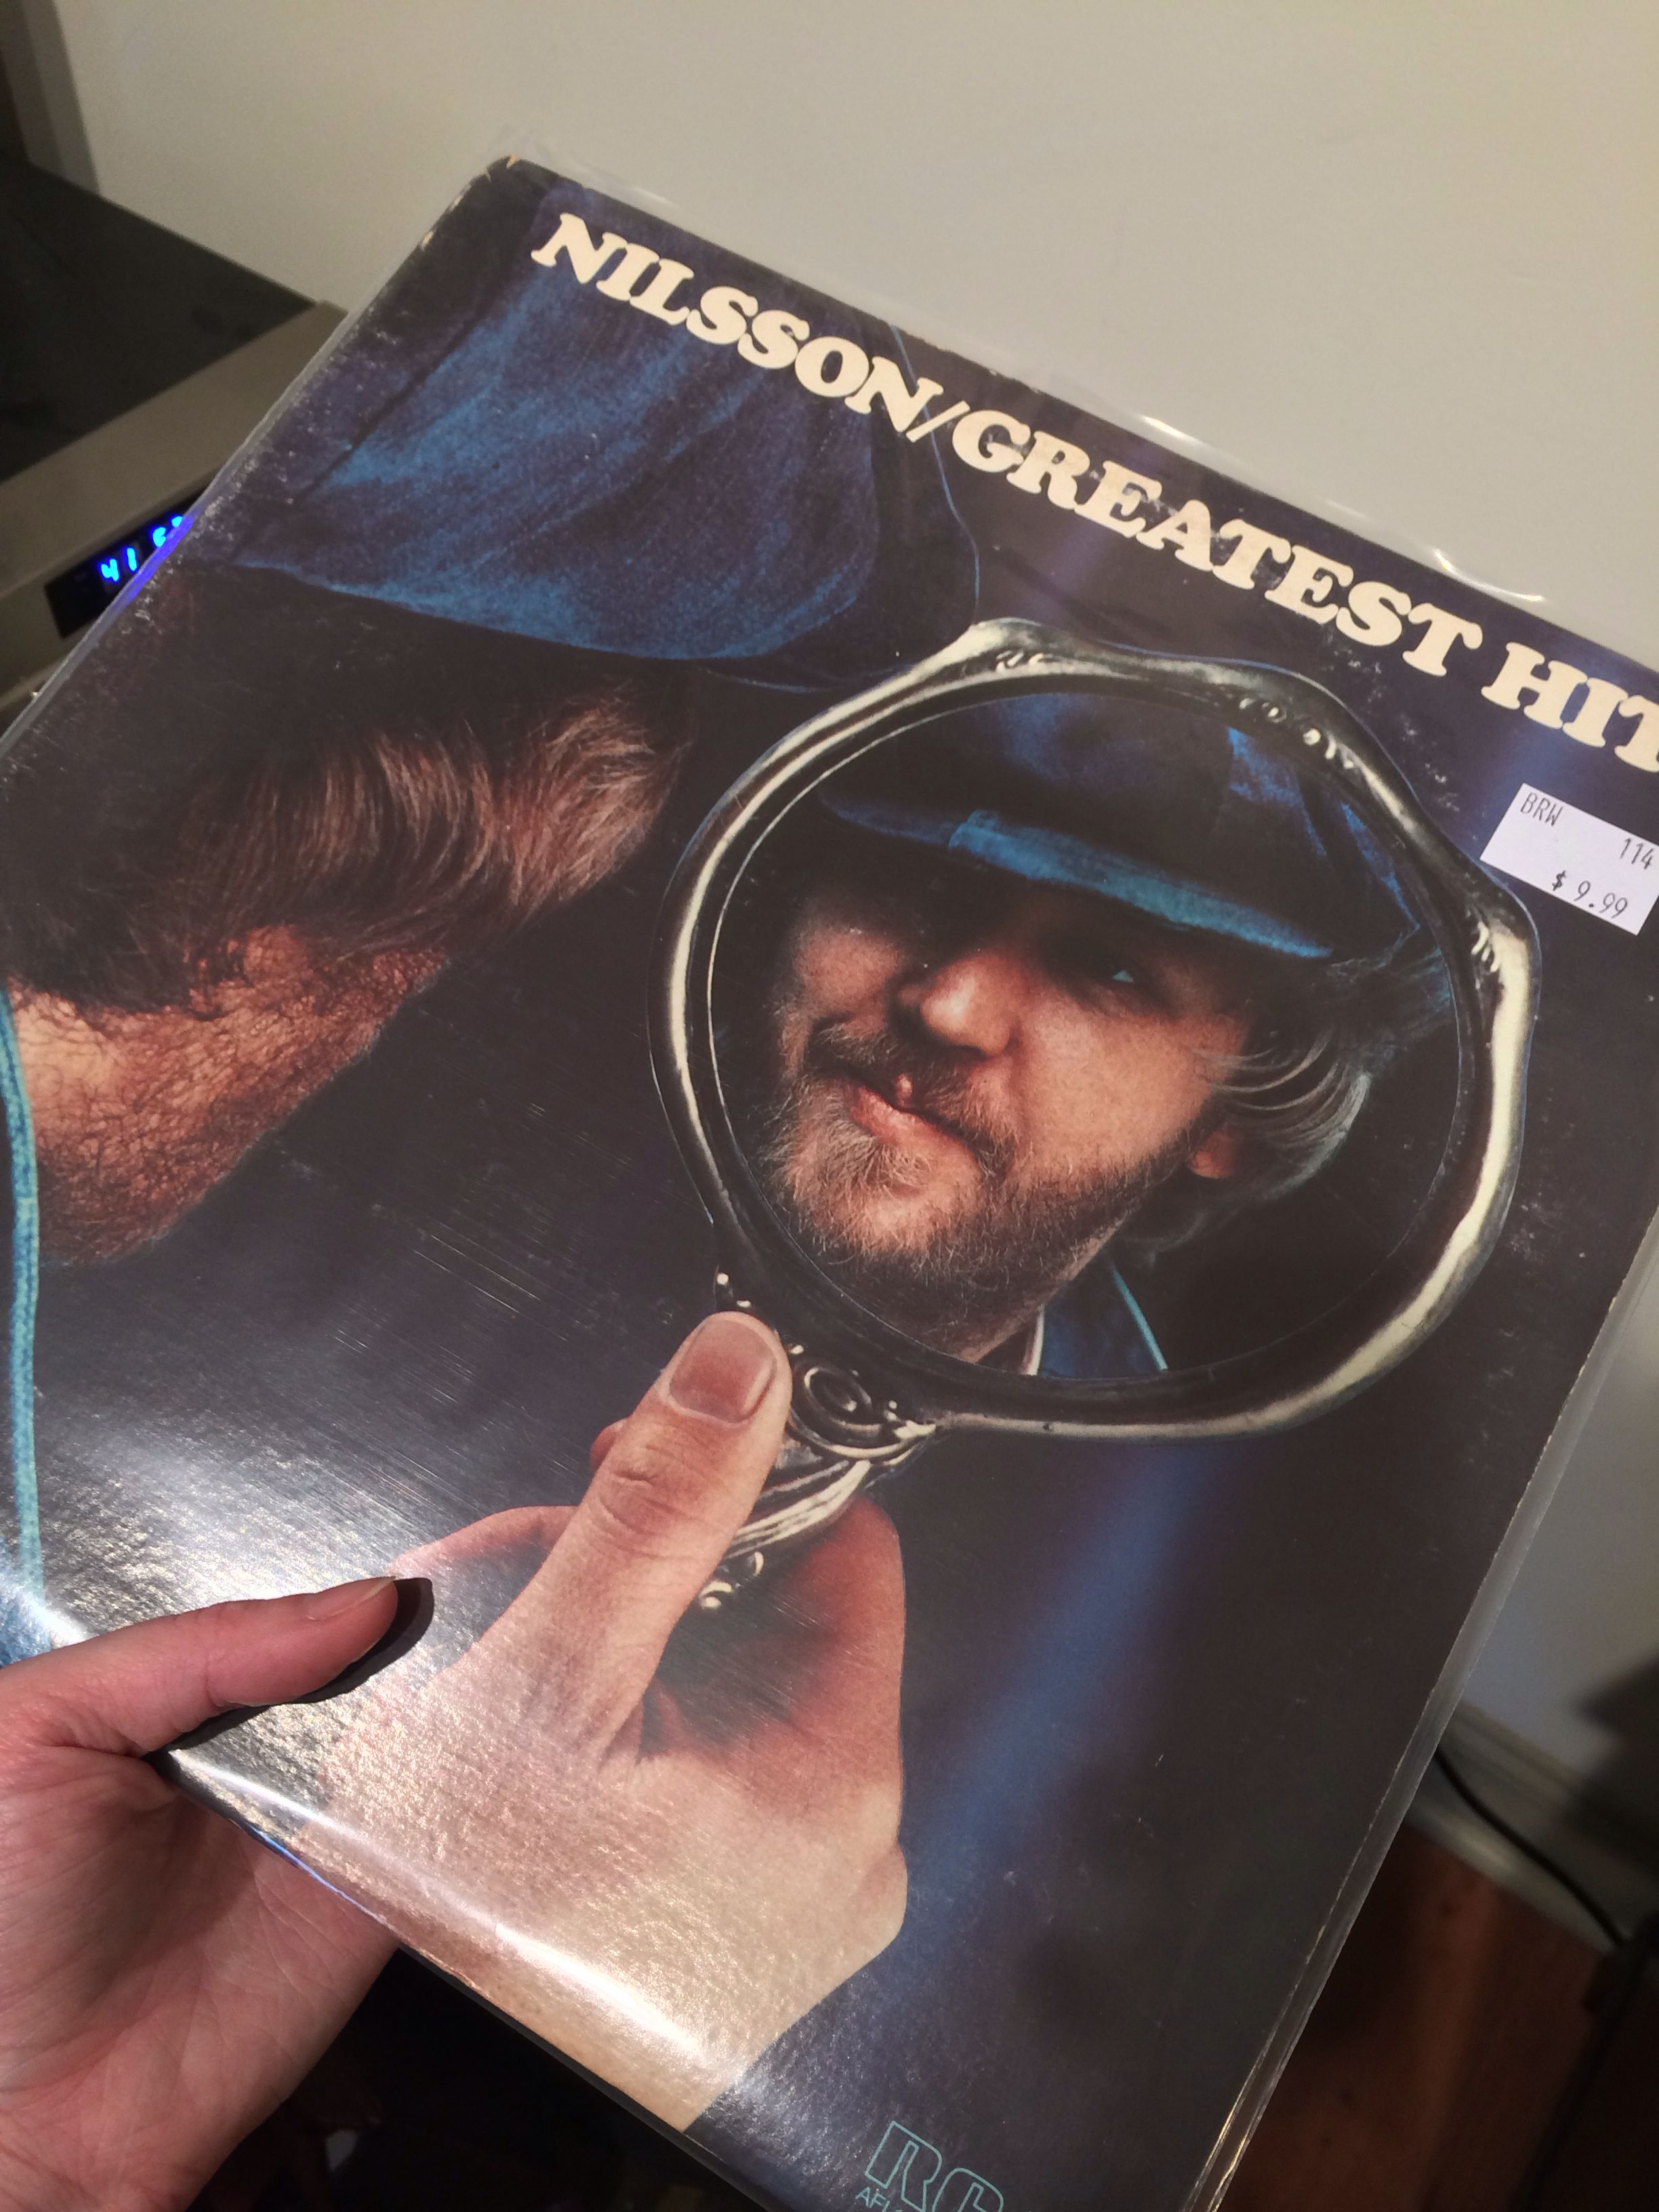 Harry Nilsson greatest hits I miss my sister, Harry